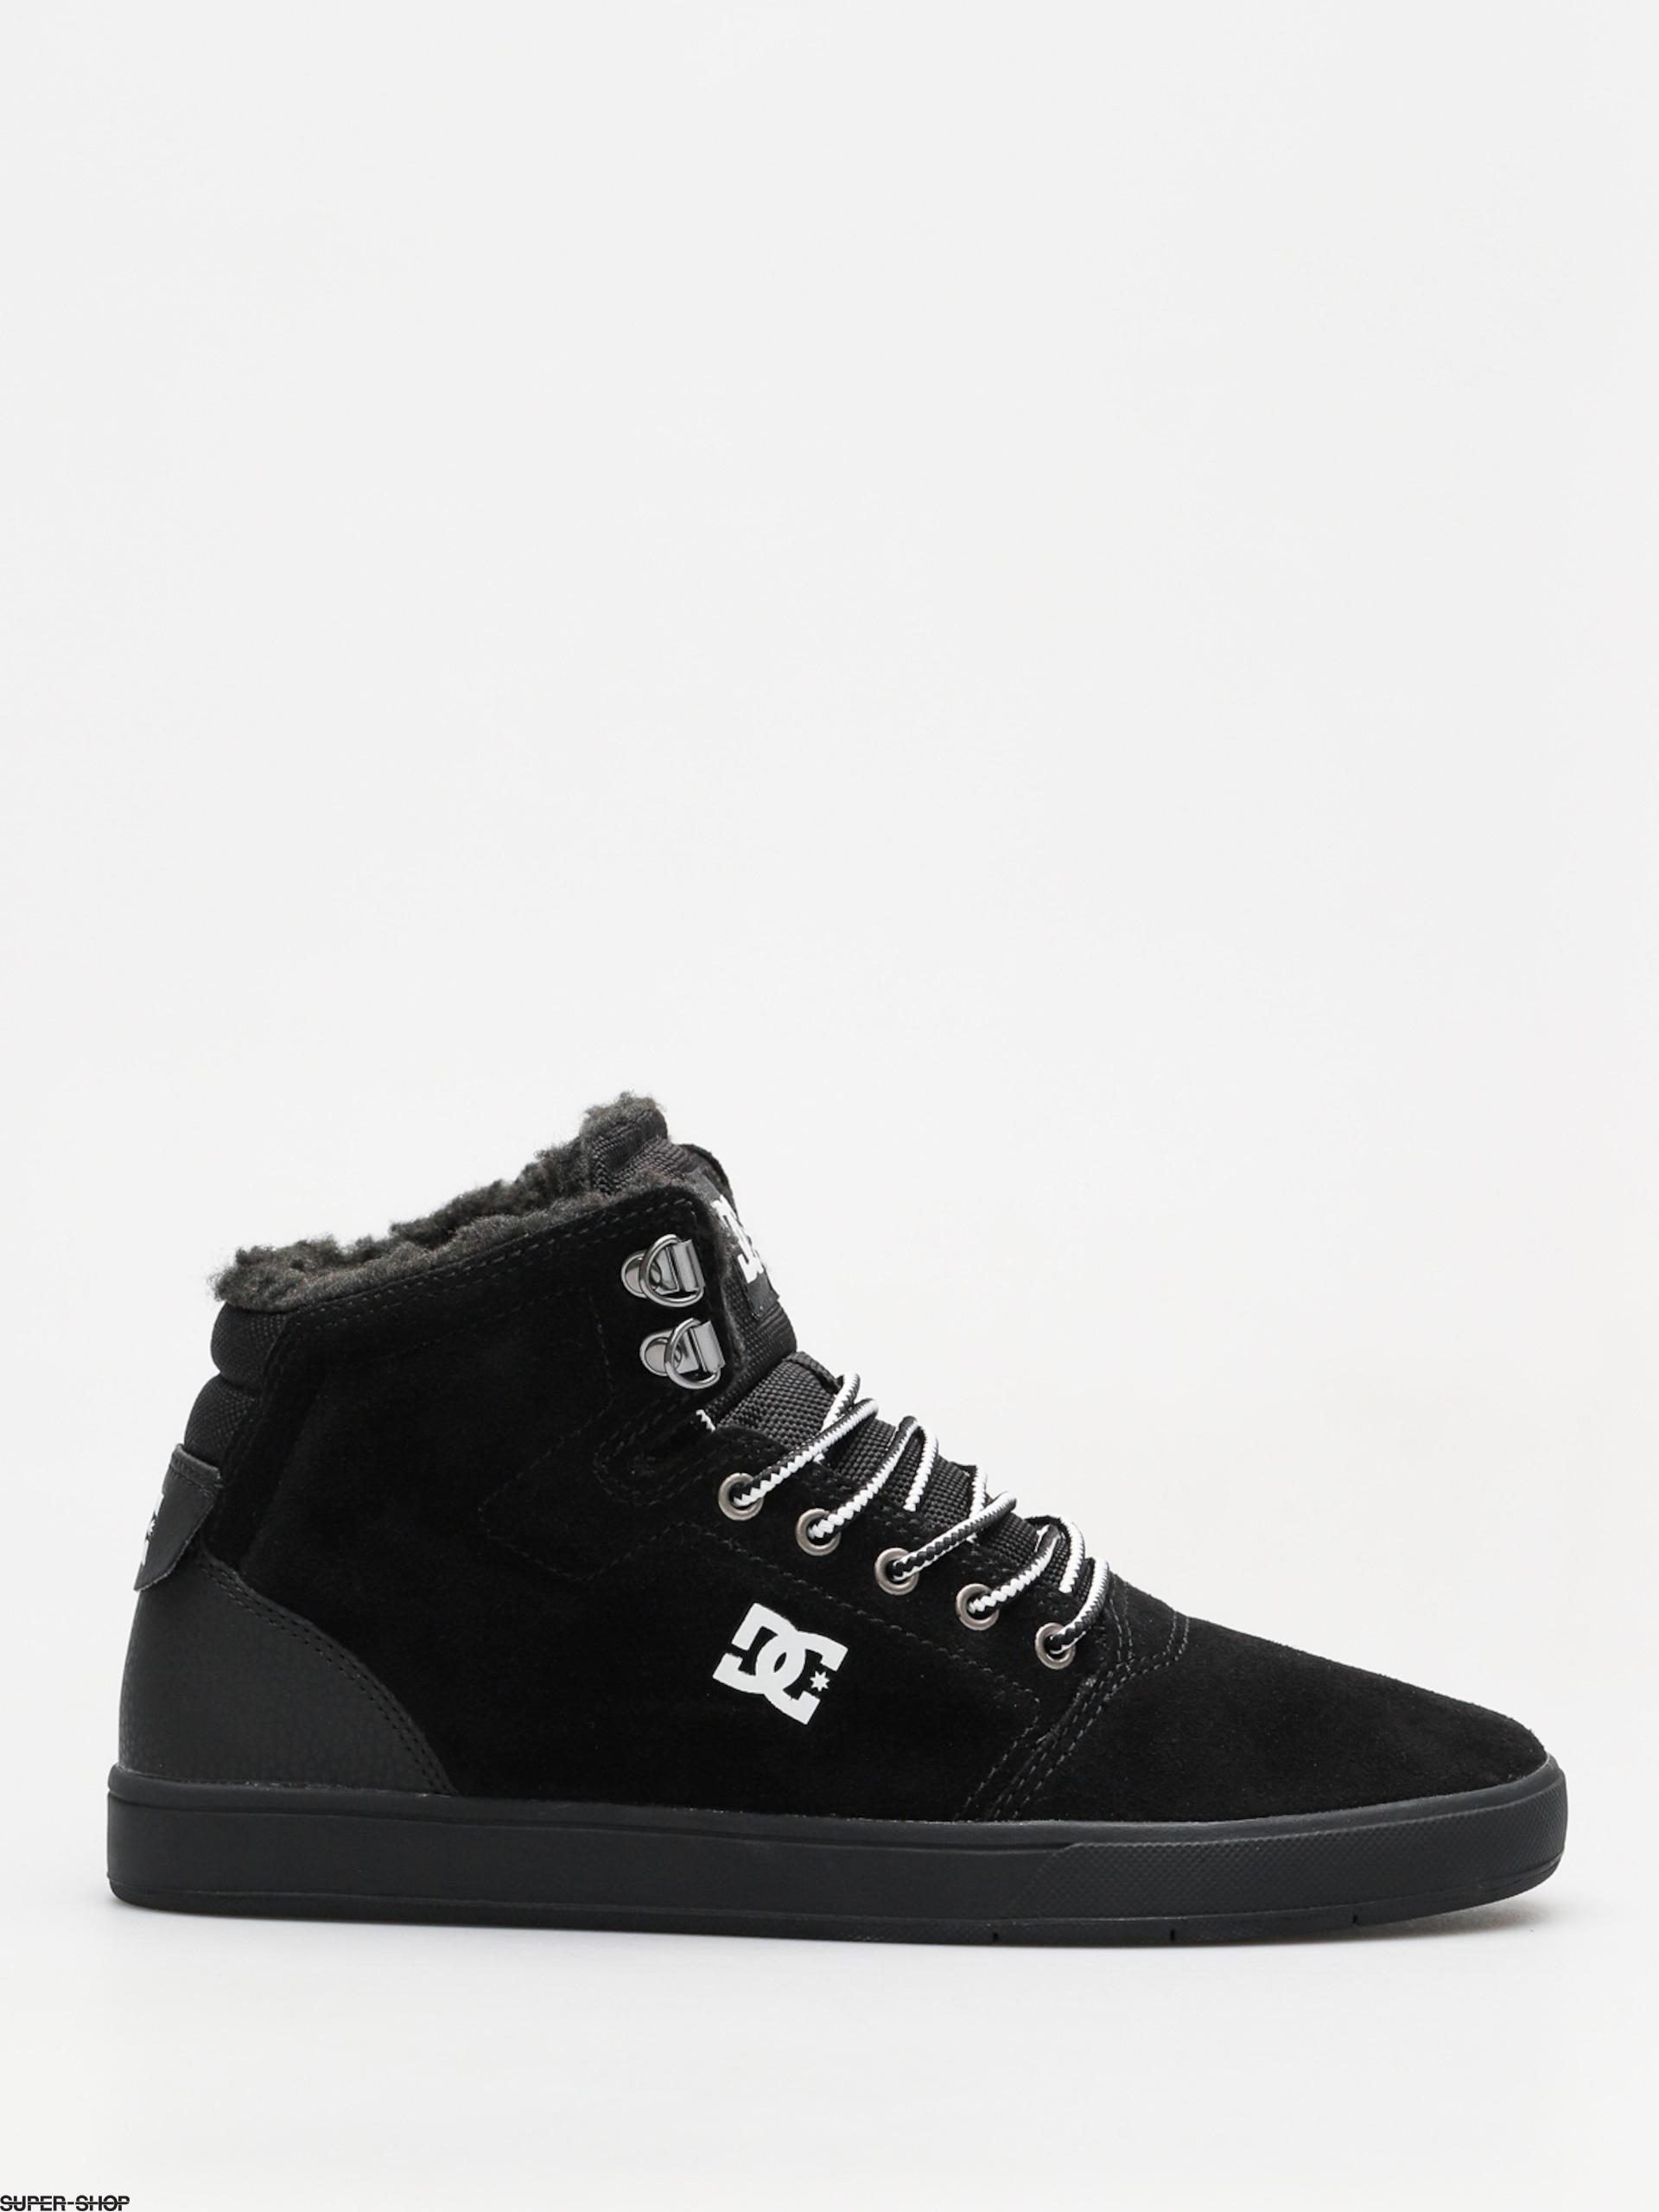 55725e7b417 970235-w1920-dc-winter-shoes-crisis-high-wnt-black-white-black.jpg